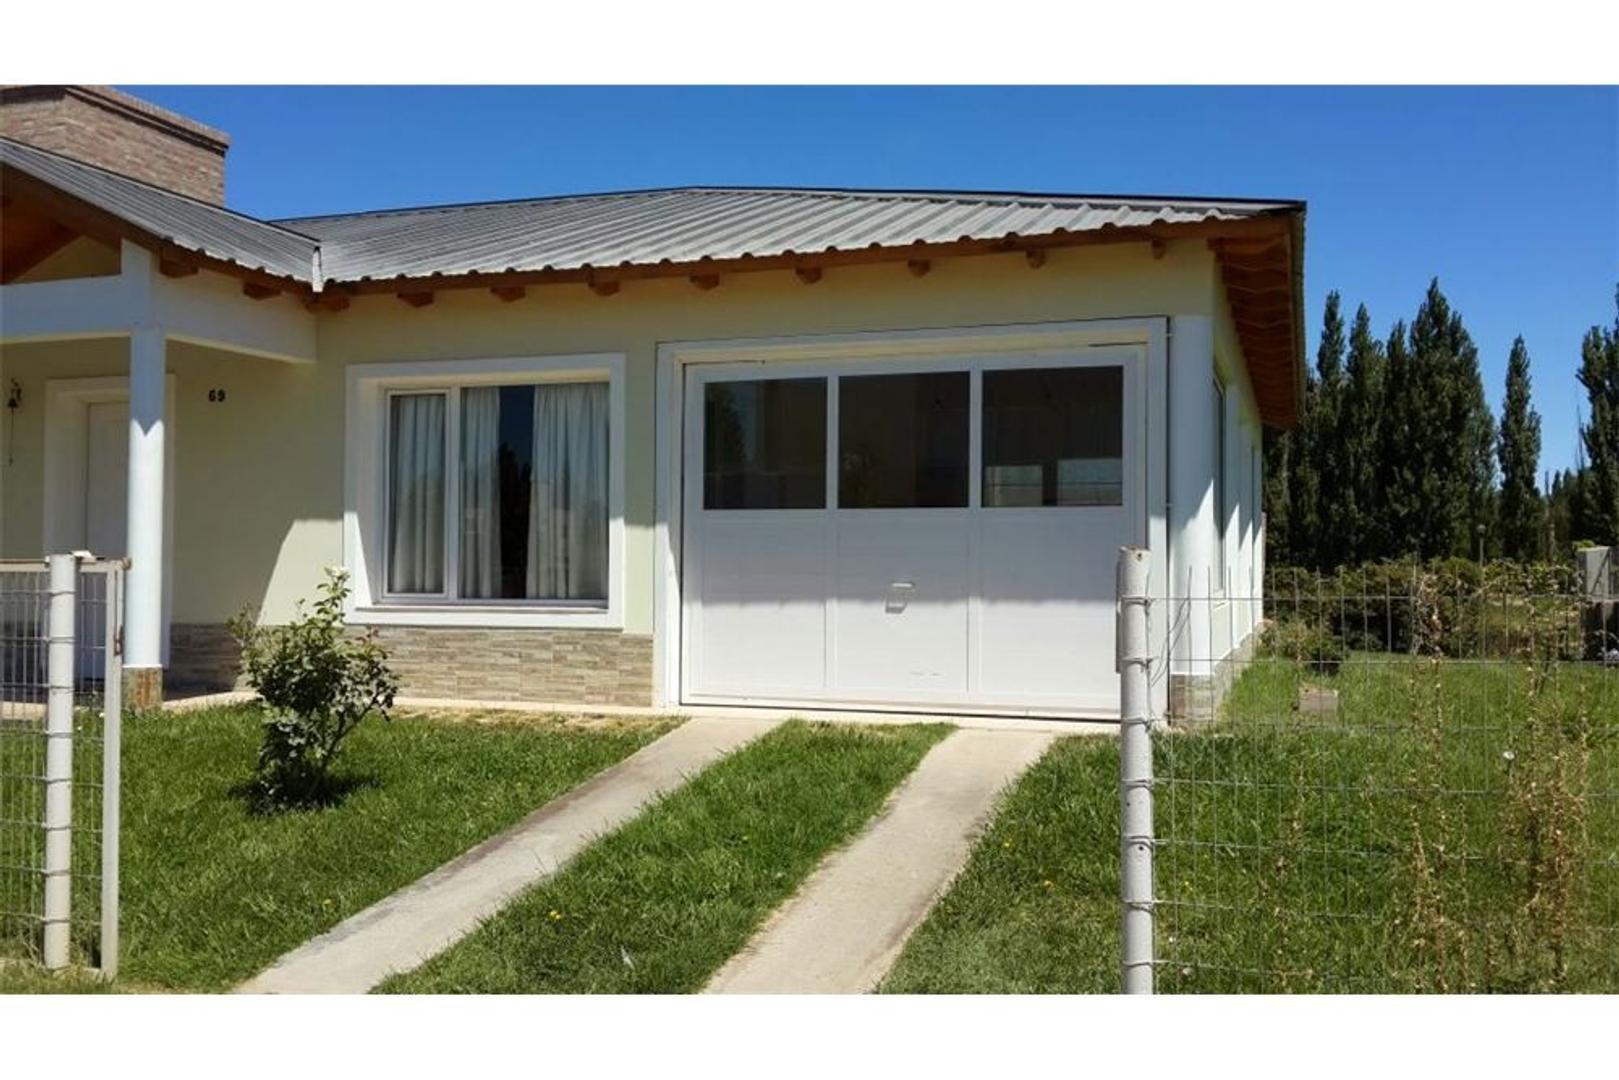 Vende casa 2 dormitorios en B El Maiten, Neuquen